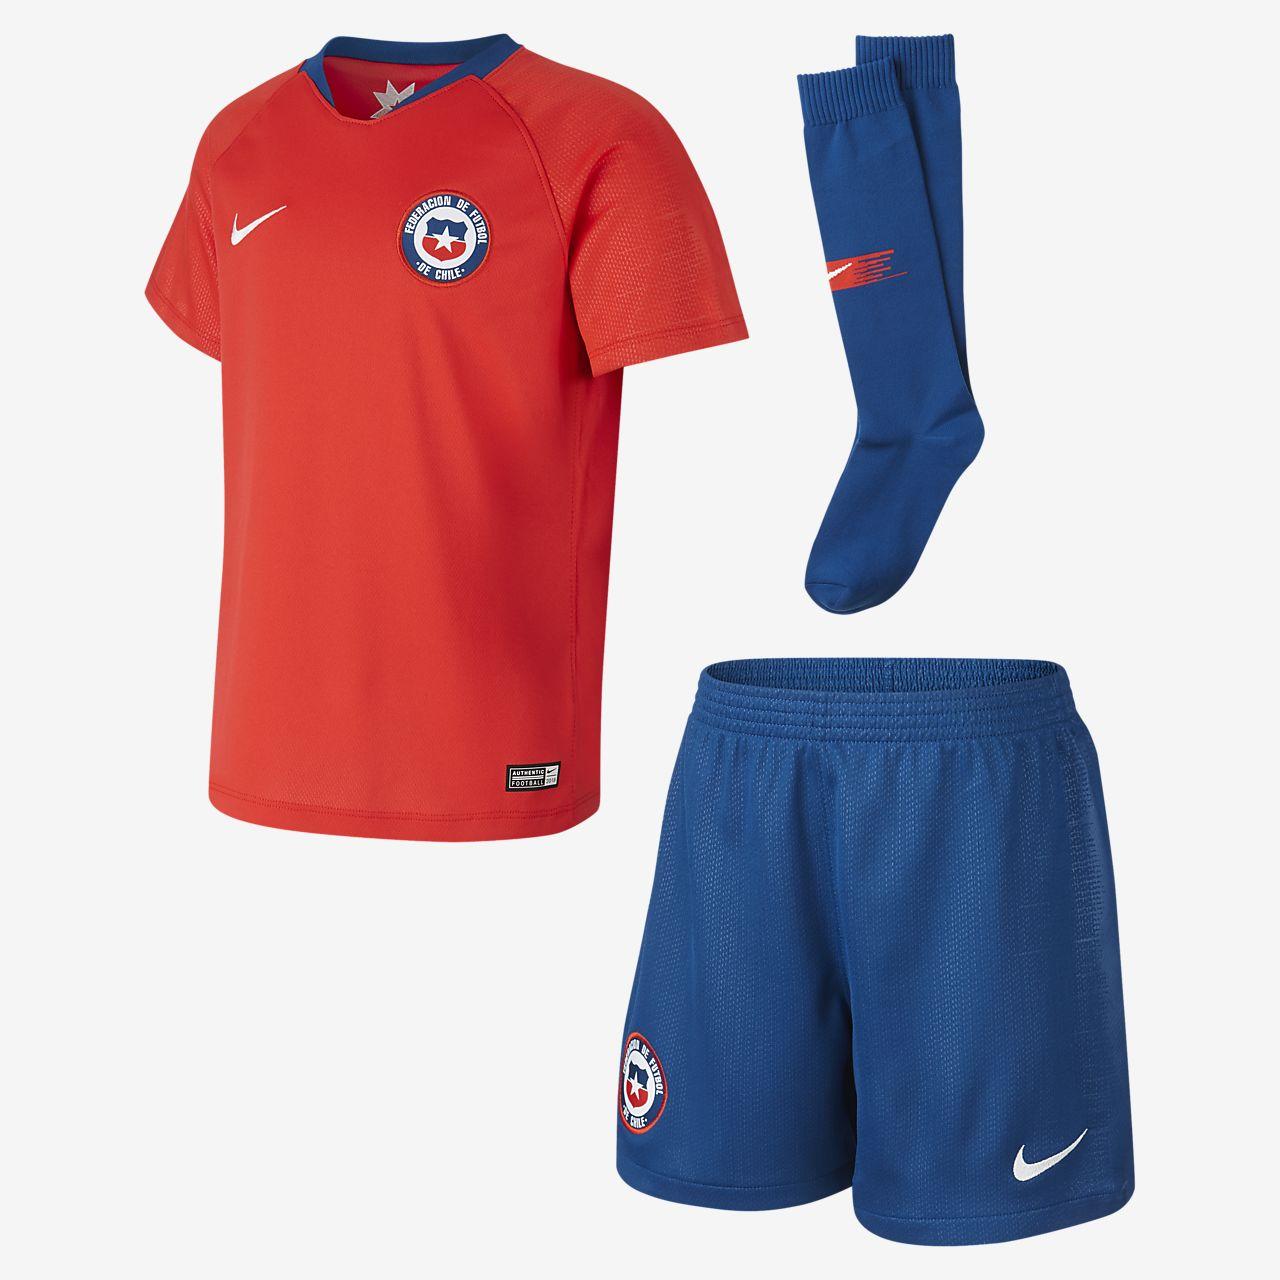 Kit de fútbol para niños talla pequeña de local 2018 Chile Stadium